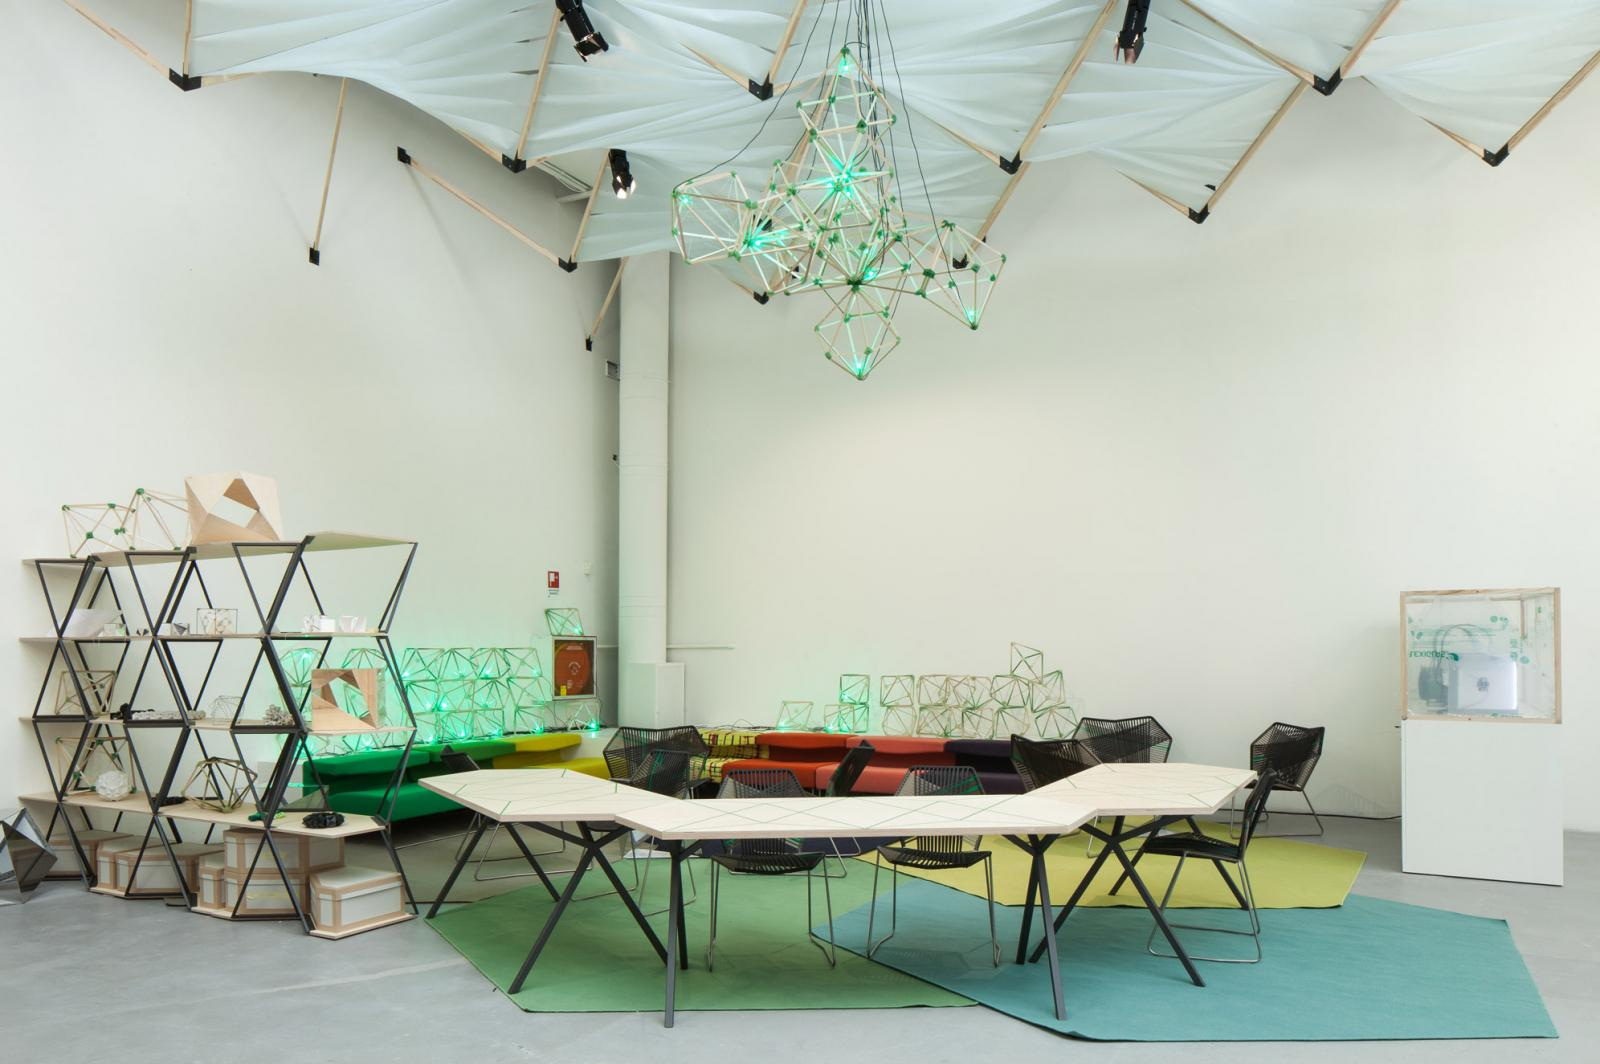 Olafur Eliasson /Green Light – An artistic workshop/ Photo: Francesco Gallo